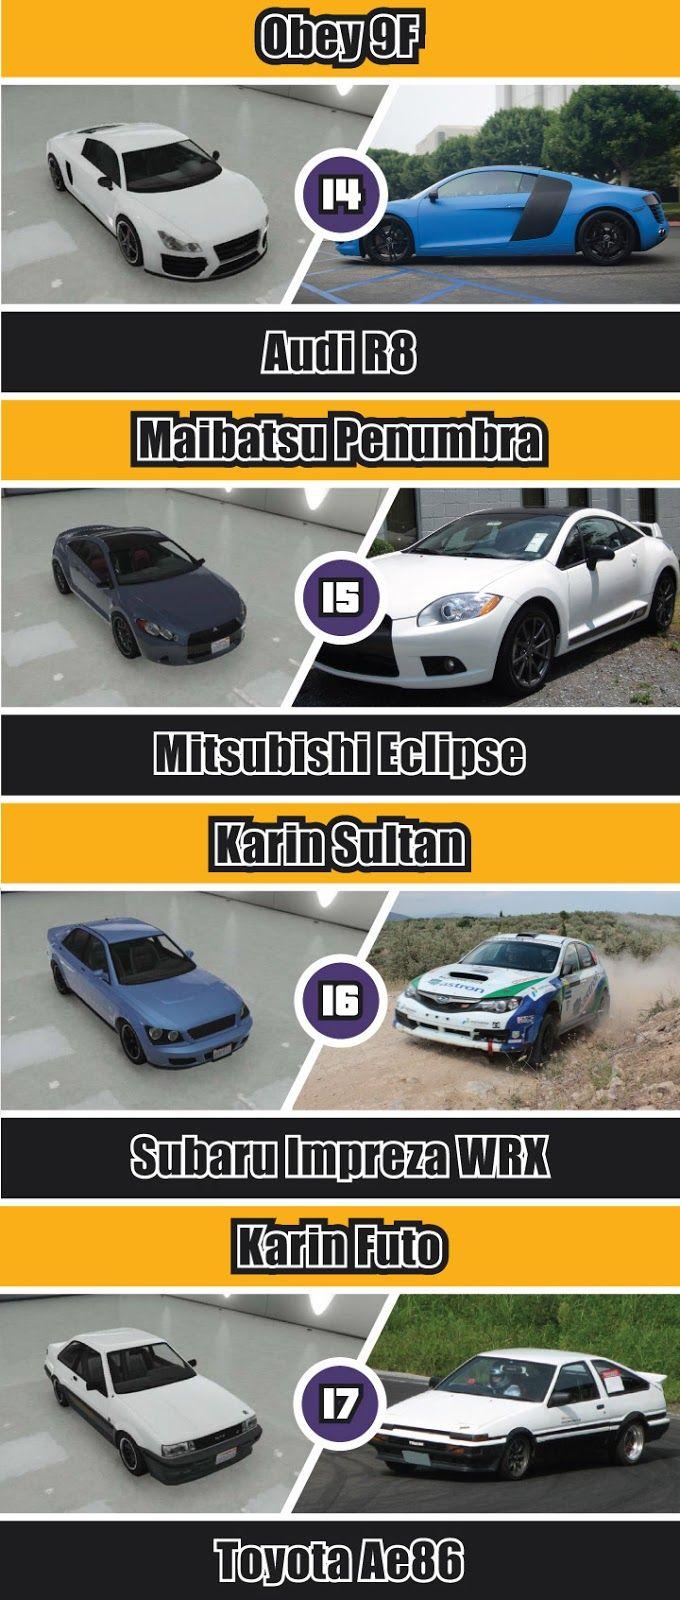 GTA-5-REAL-LIFE-CARS